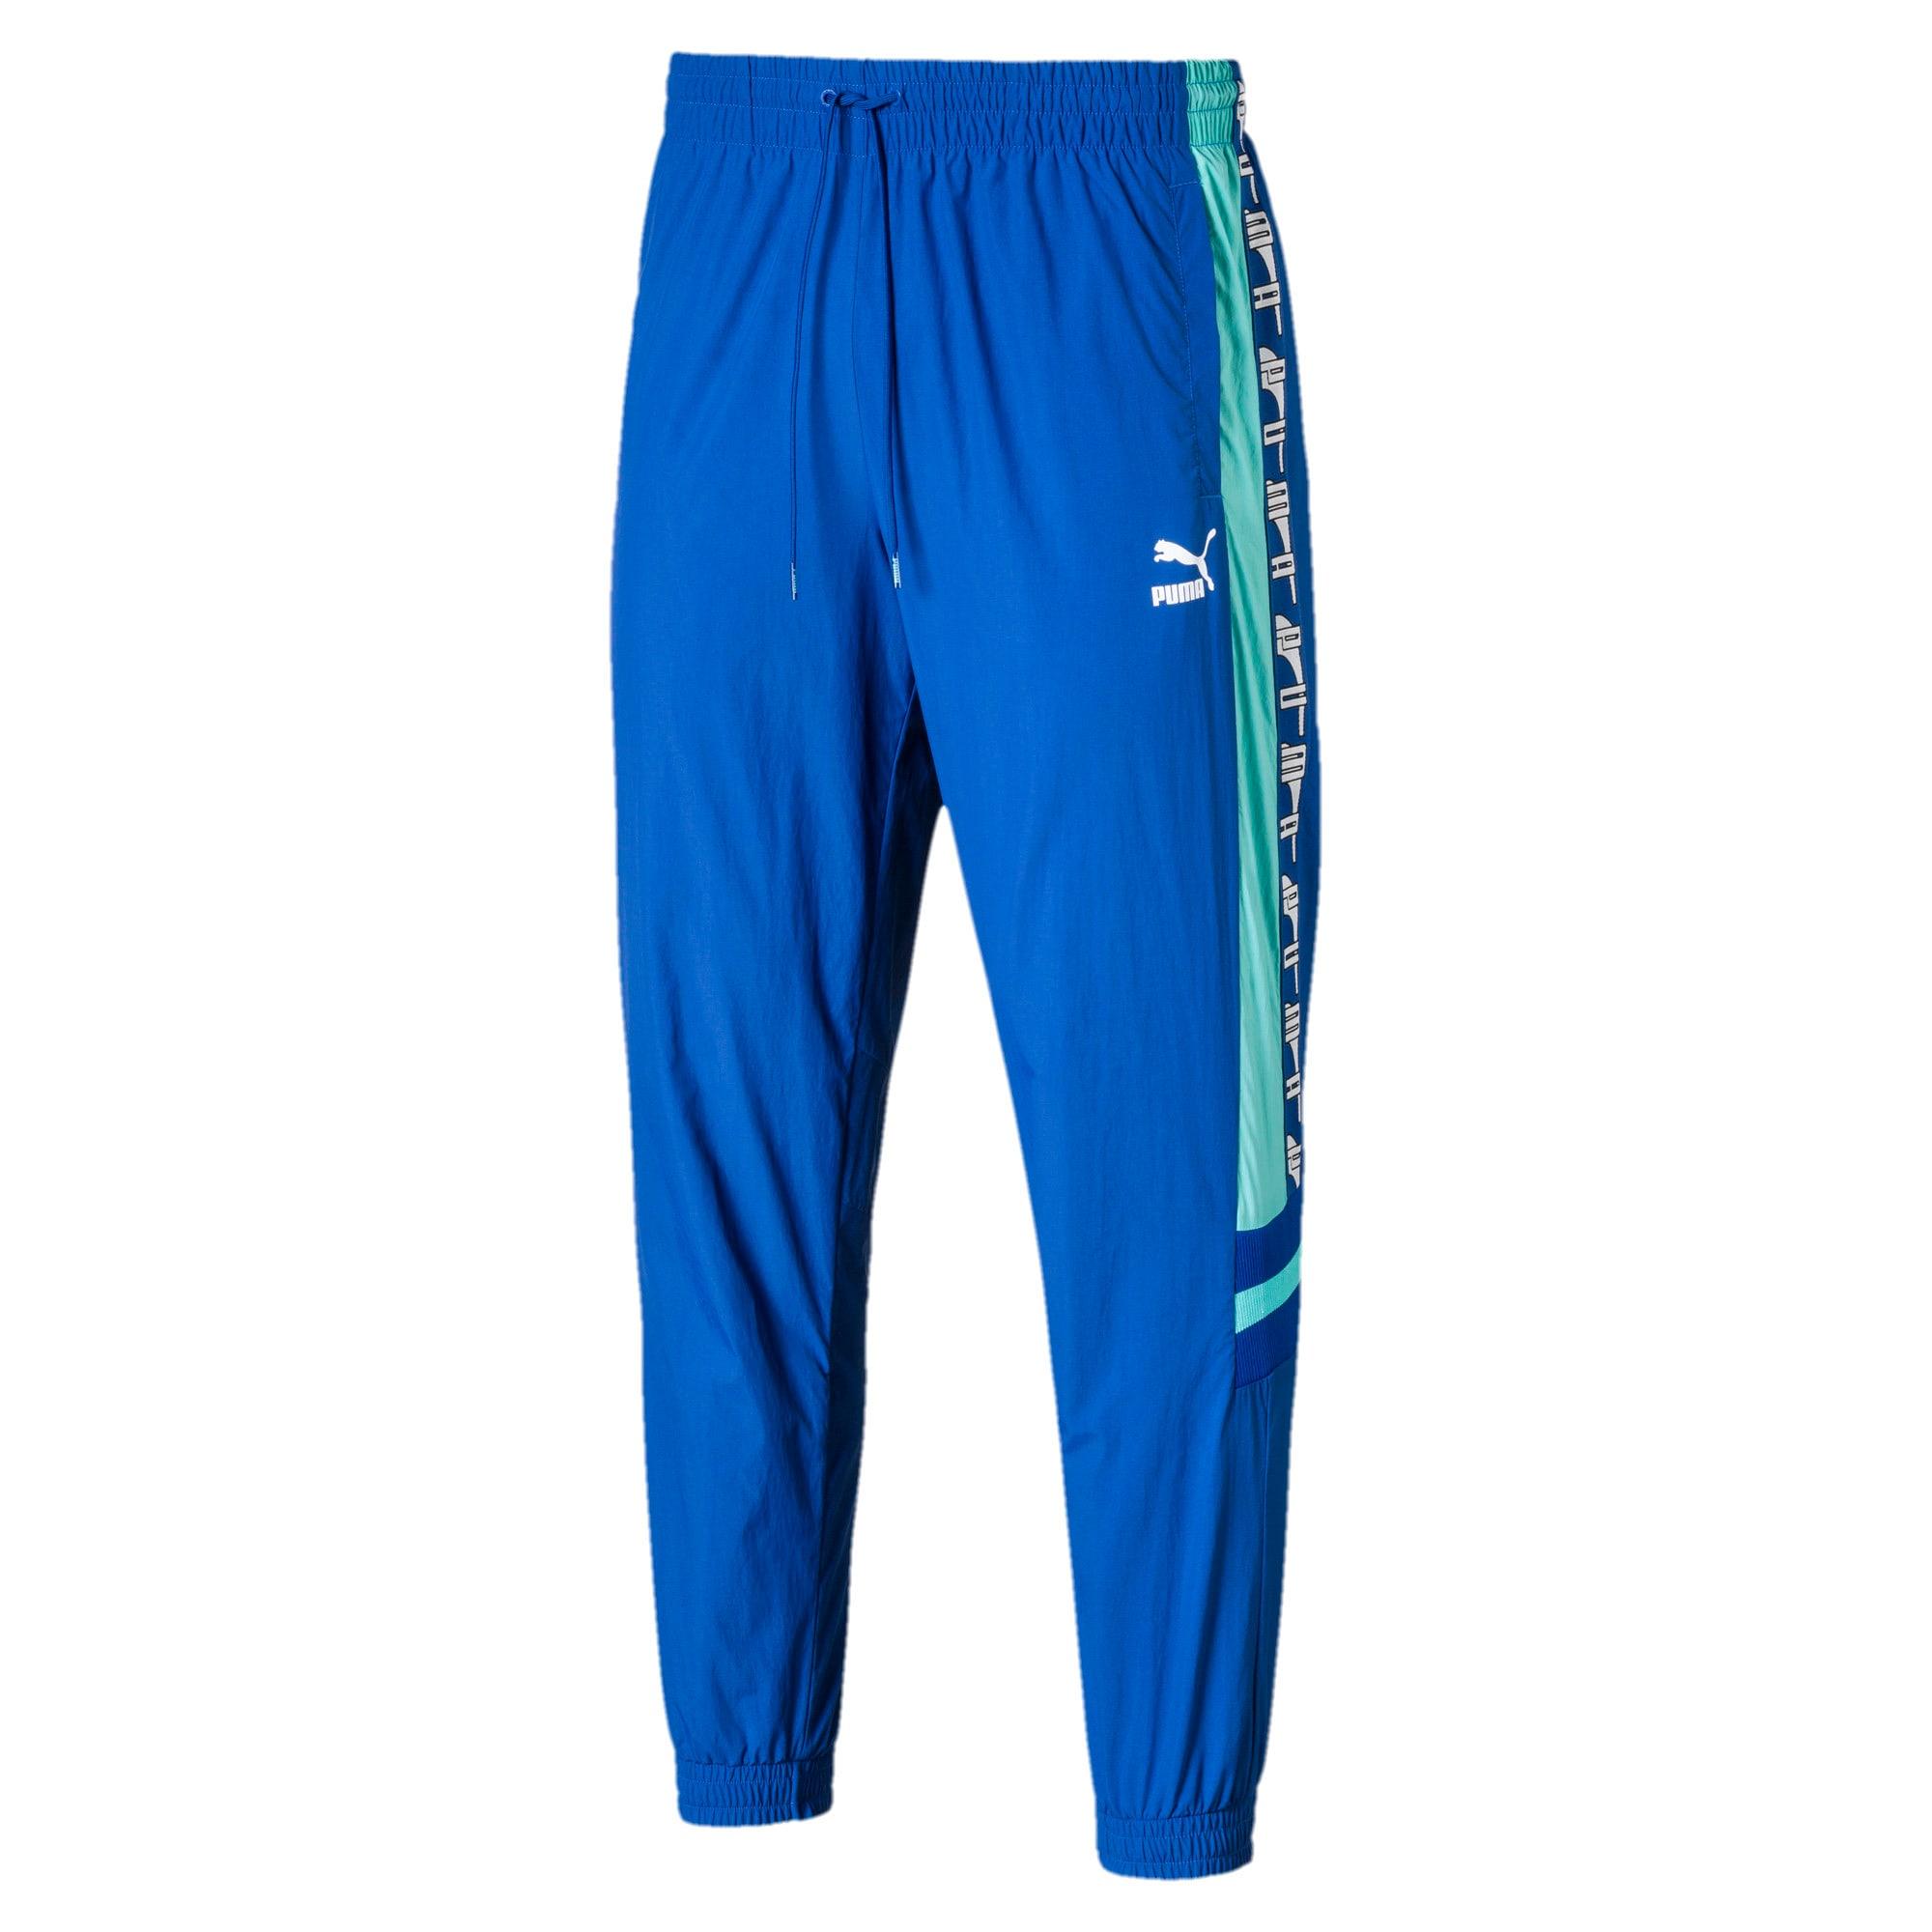 Thumbnail 1 of PUMA XTG Men's Woven Pants, Galaxy Blue, medium